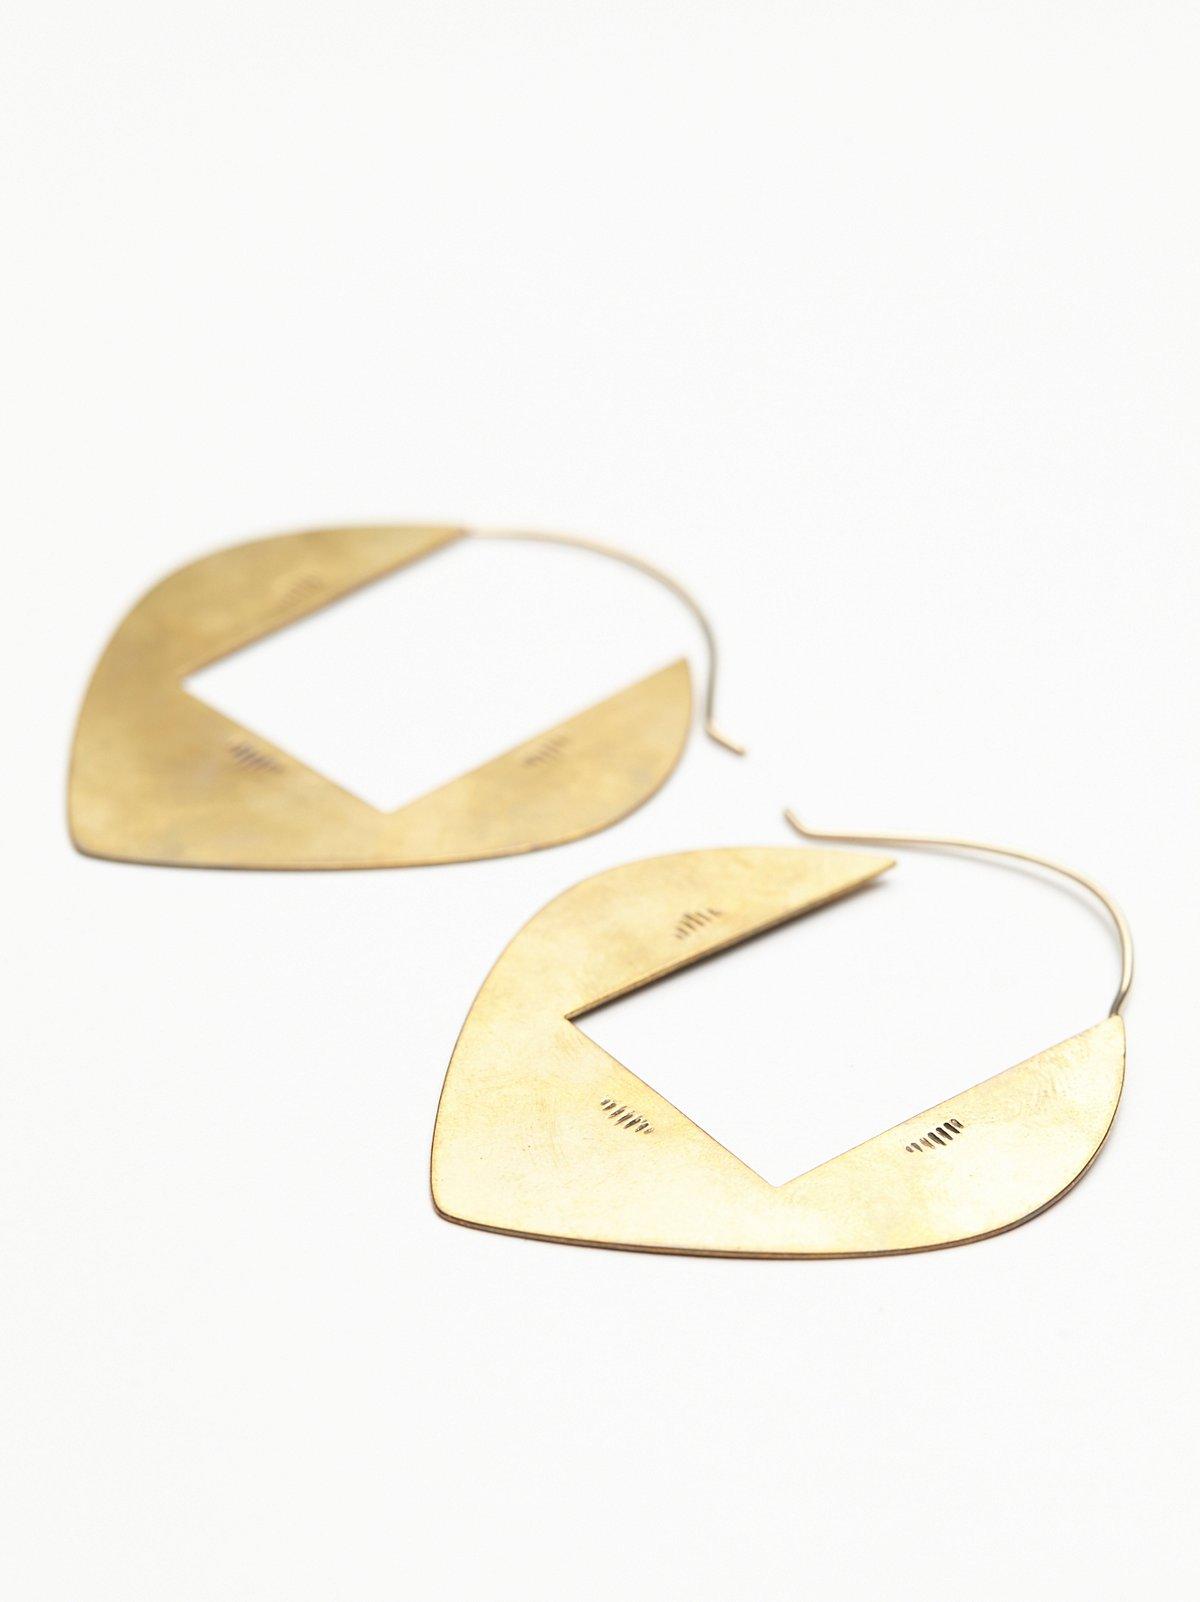 Amante耳环